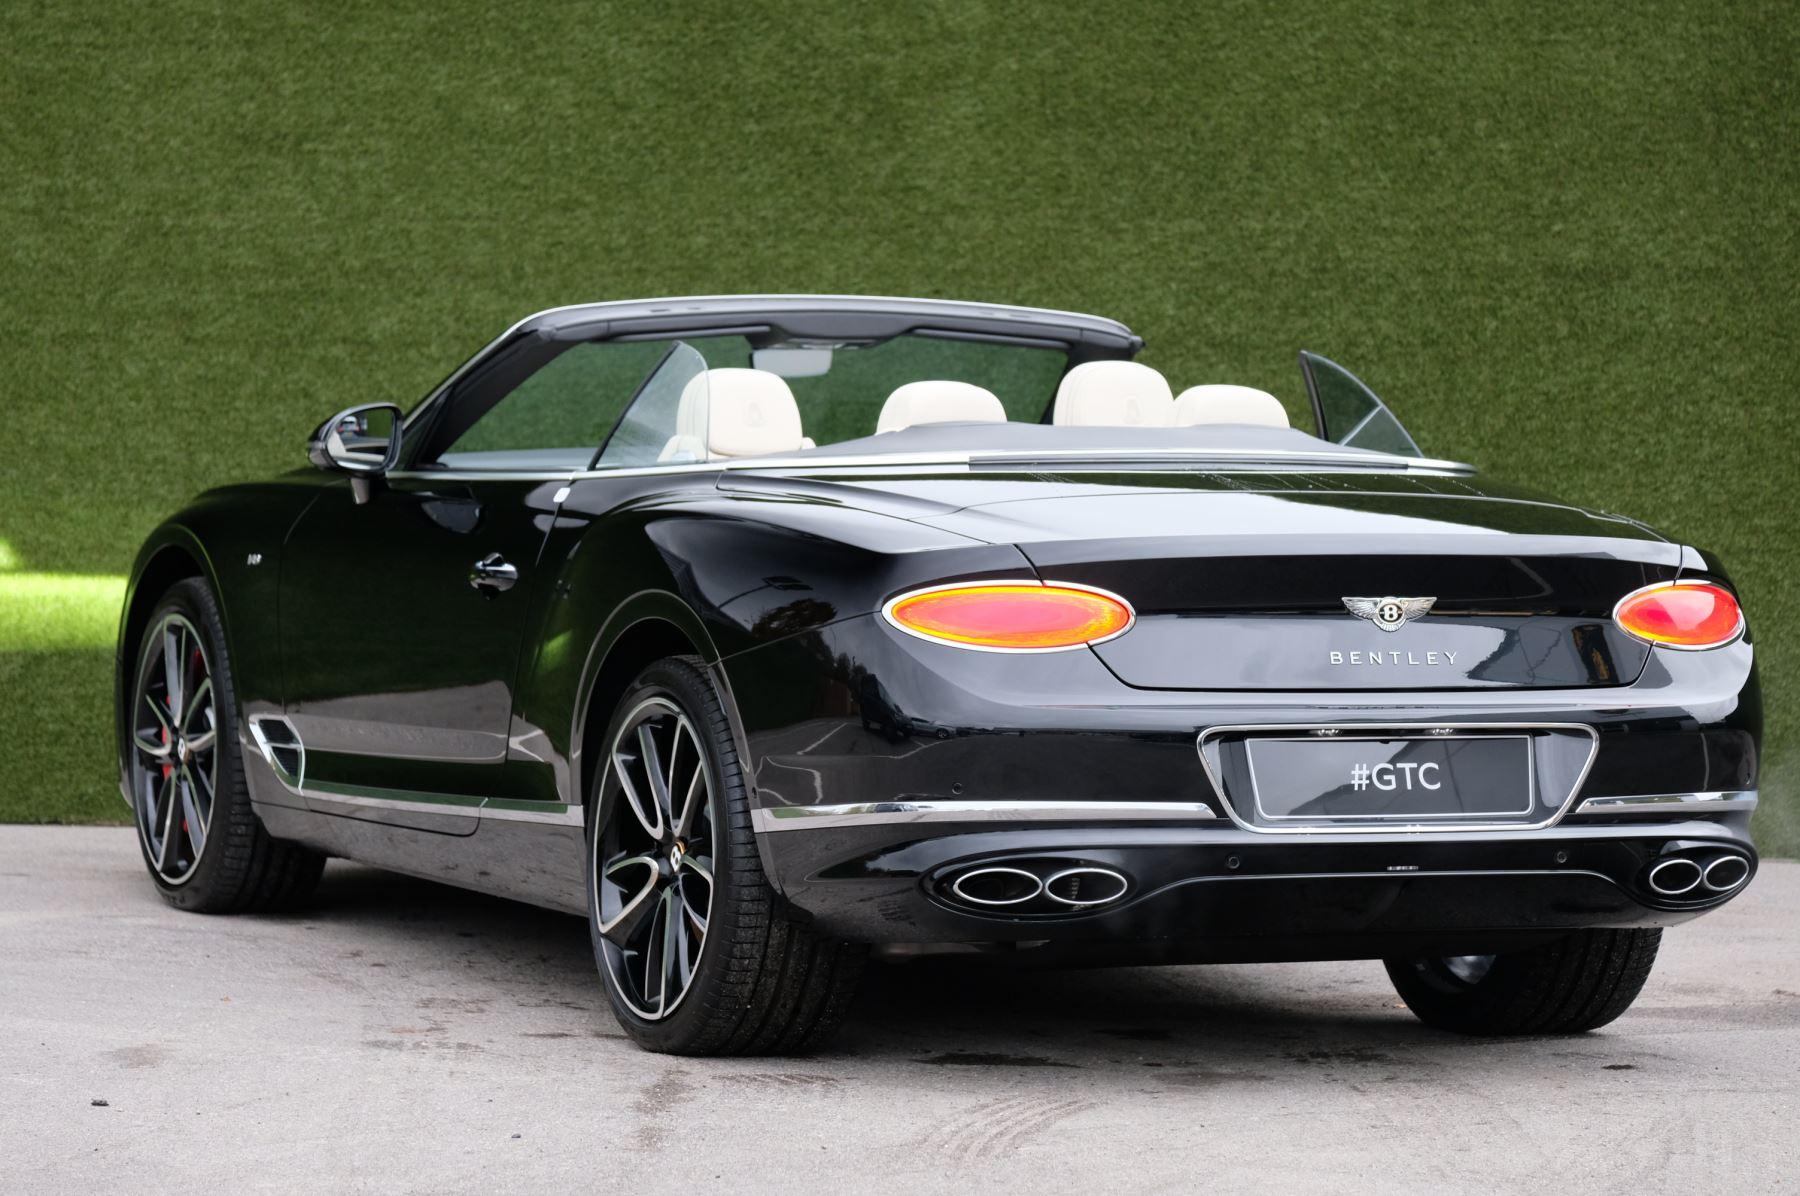 Bentley Continental GTC 4.0 V8 Mulliner Driving Spec 2dr Auto [Tour Spec] image 5